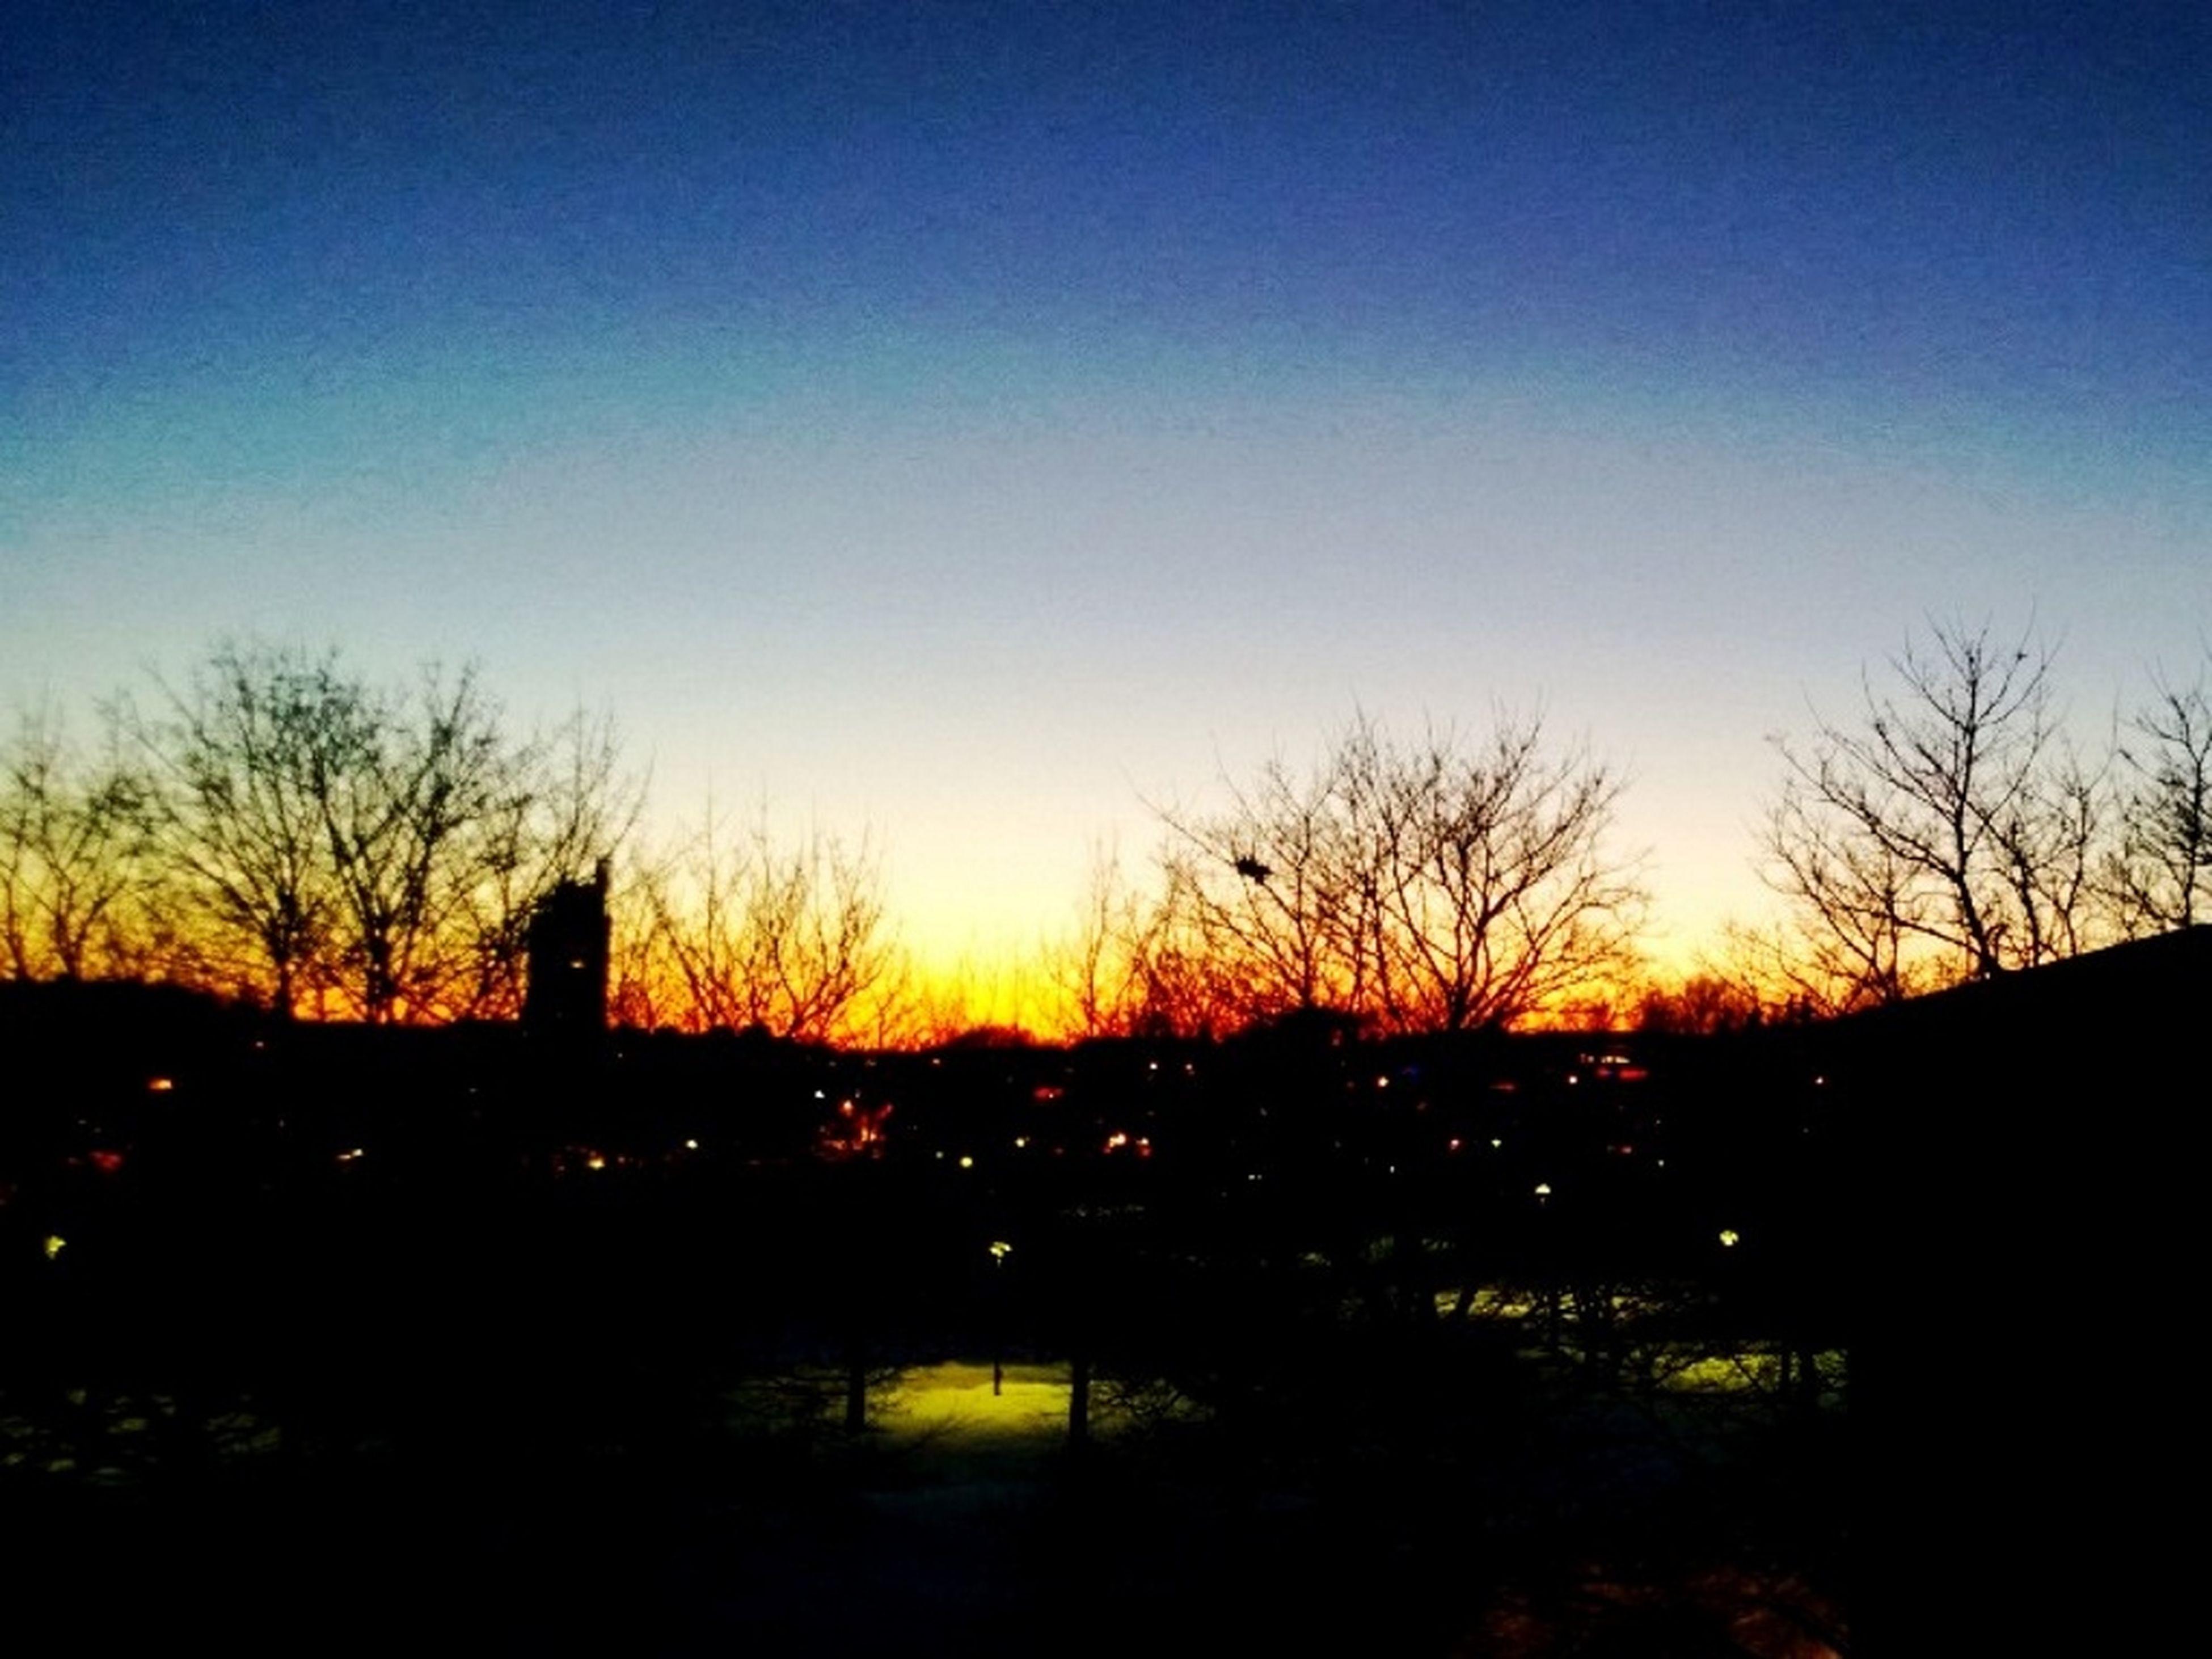 sunset, silhouette, clear sky, bare tree, tree, tranquil scene, copy space, tranquility, scenics, beauty in nature, blue, orange color, nature, landscape, sun, idyllic, dark, sky, dusk, built structure